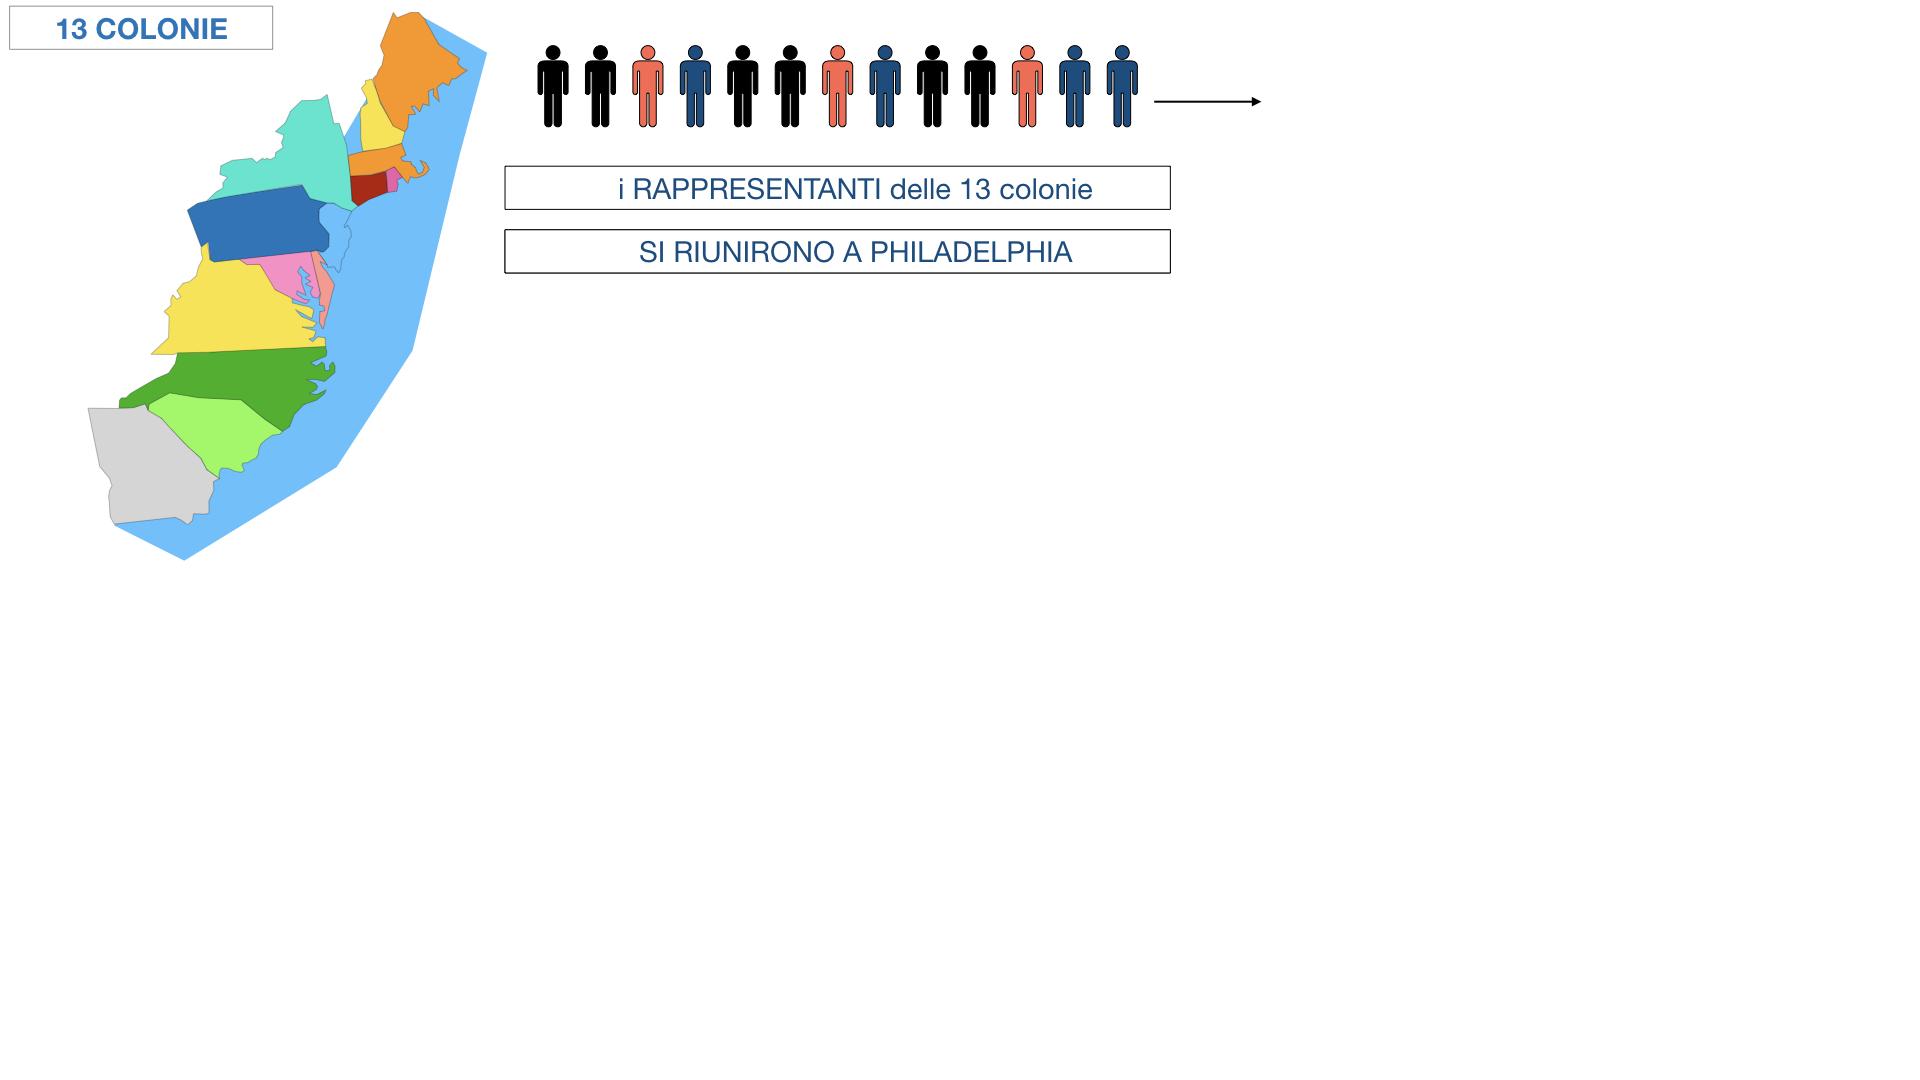 GUERRA DI INDIPENDENZA AMERICANA_SIMULAZIONE.061